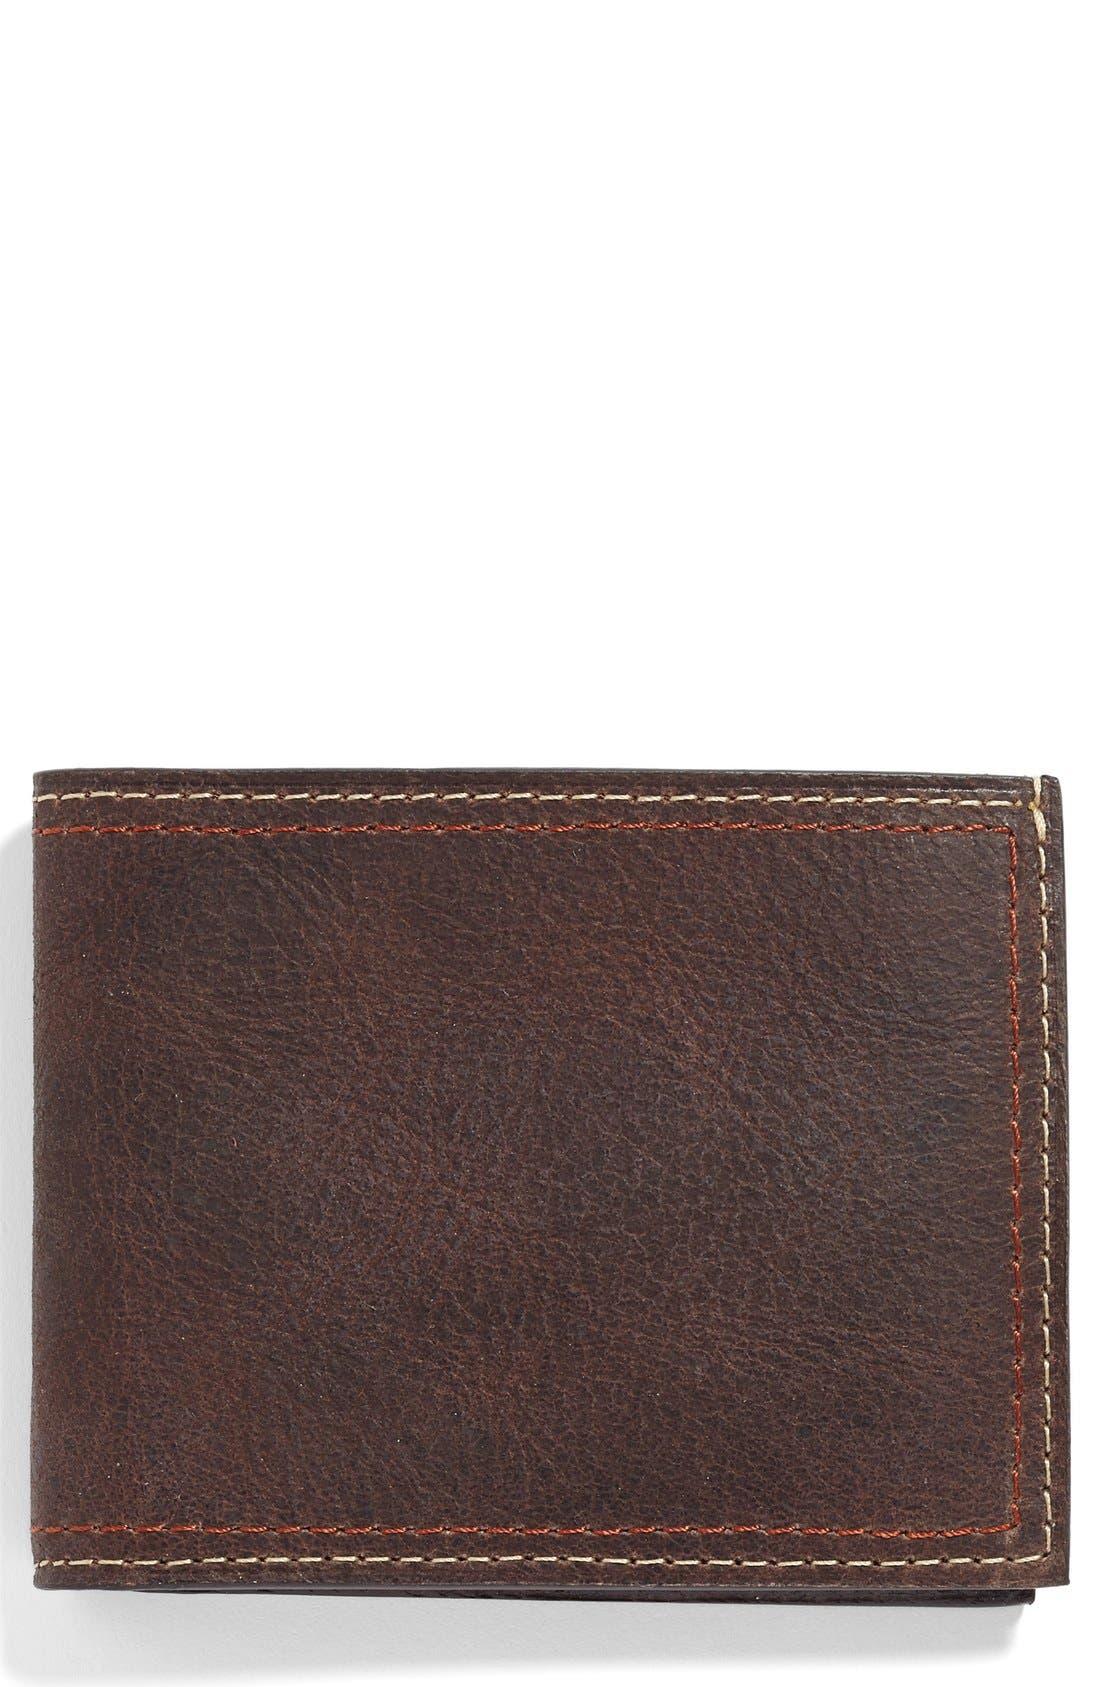 Martin Dingman Water Buffalo Leather Wallet